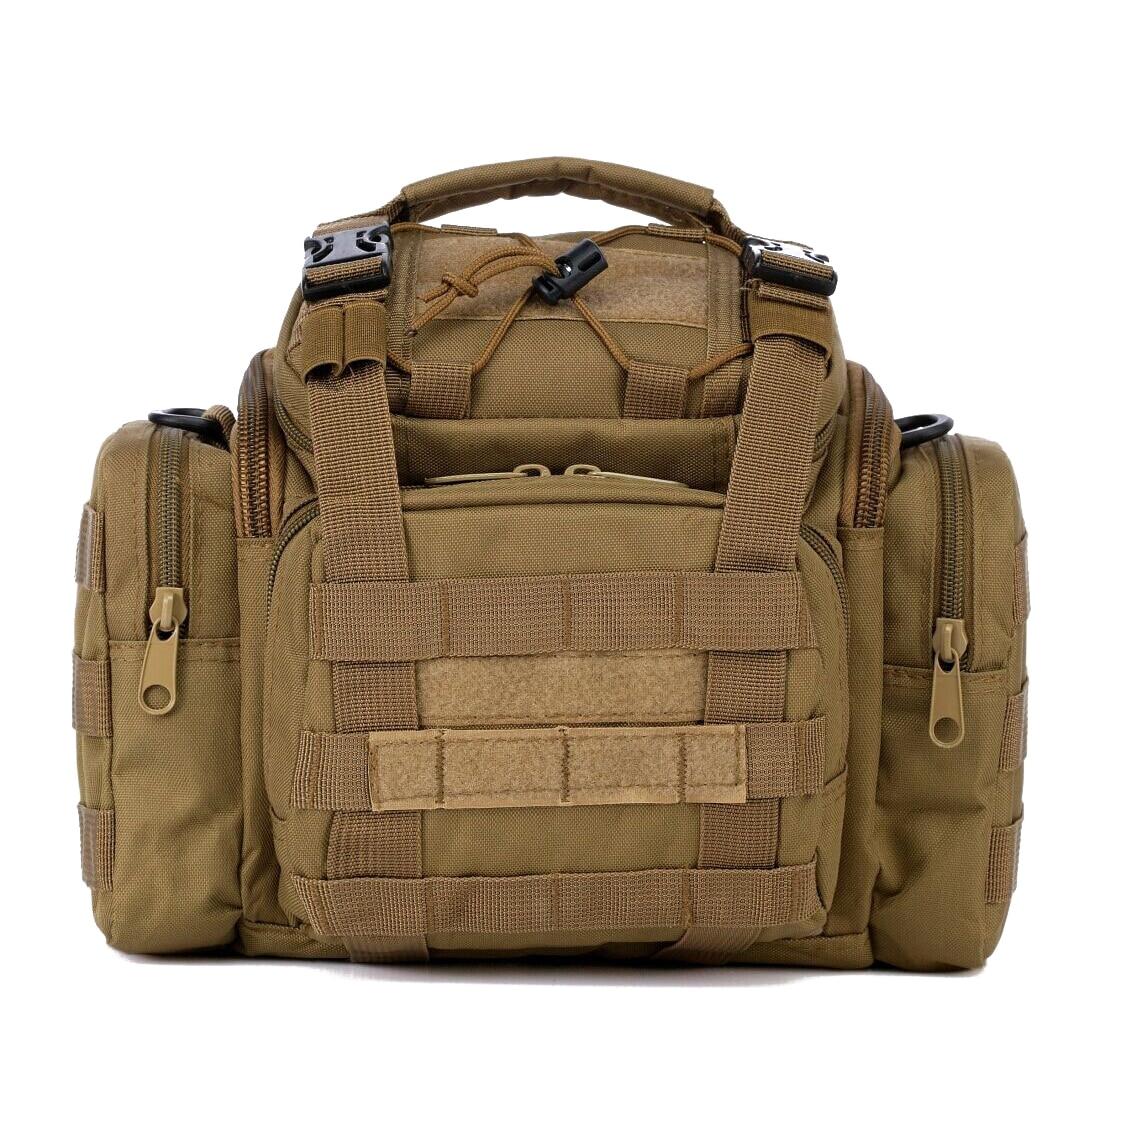 Sea/<font><b>Carp</b></font>/Fly Fishing Tackle Bag Waterproof Storage Waist Shoulder Carry Case sandy